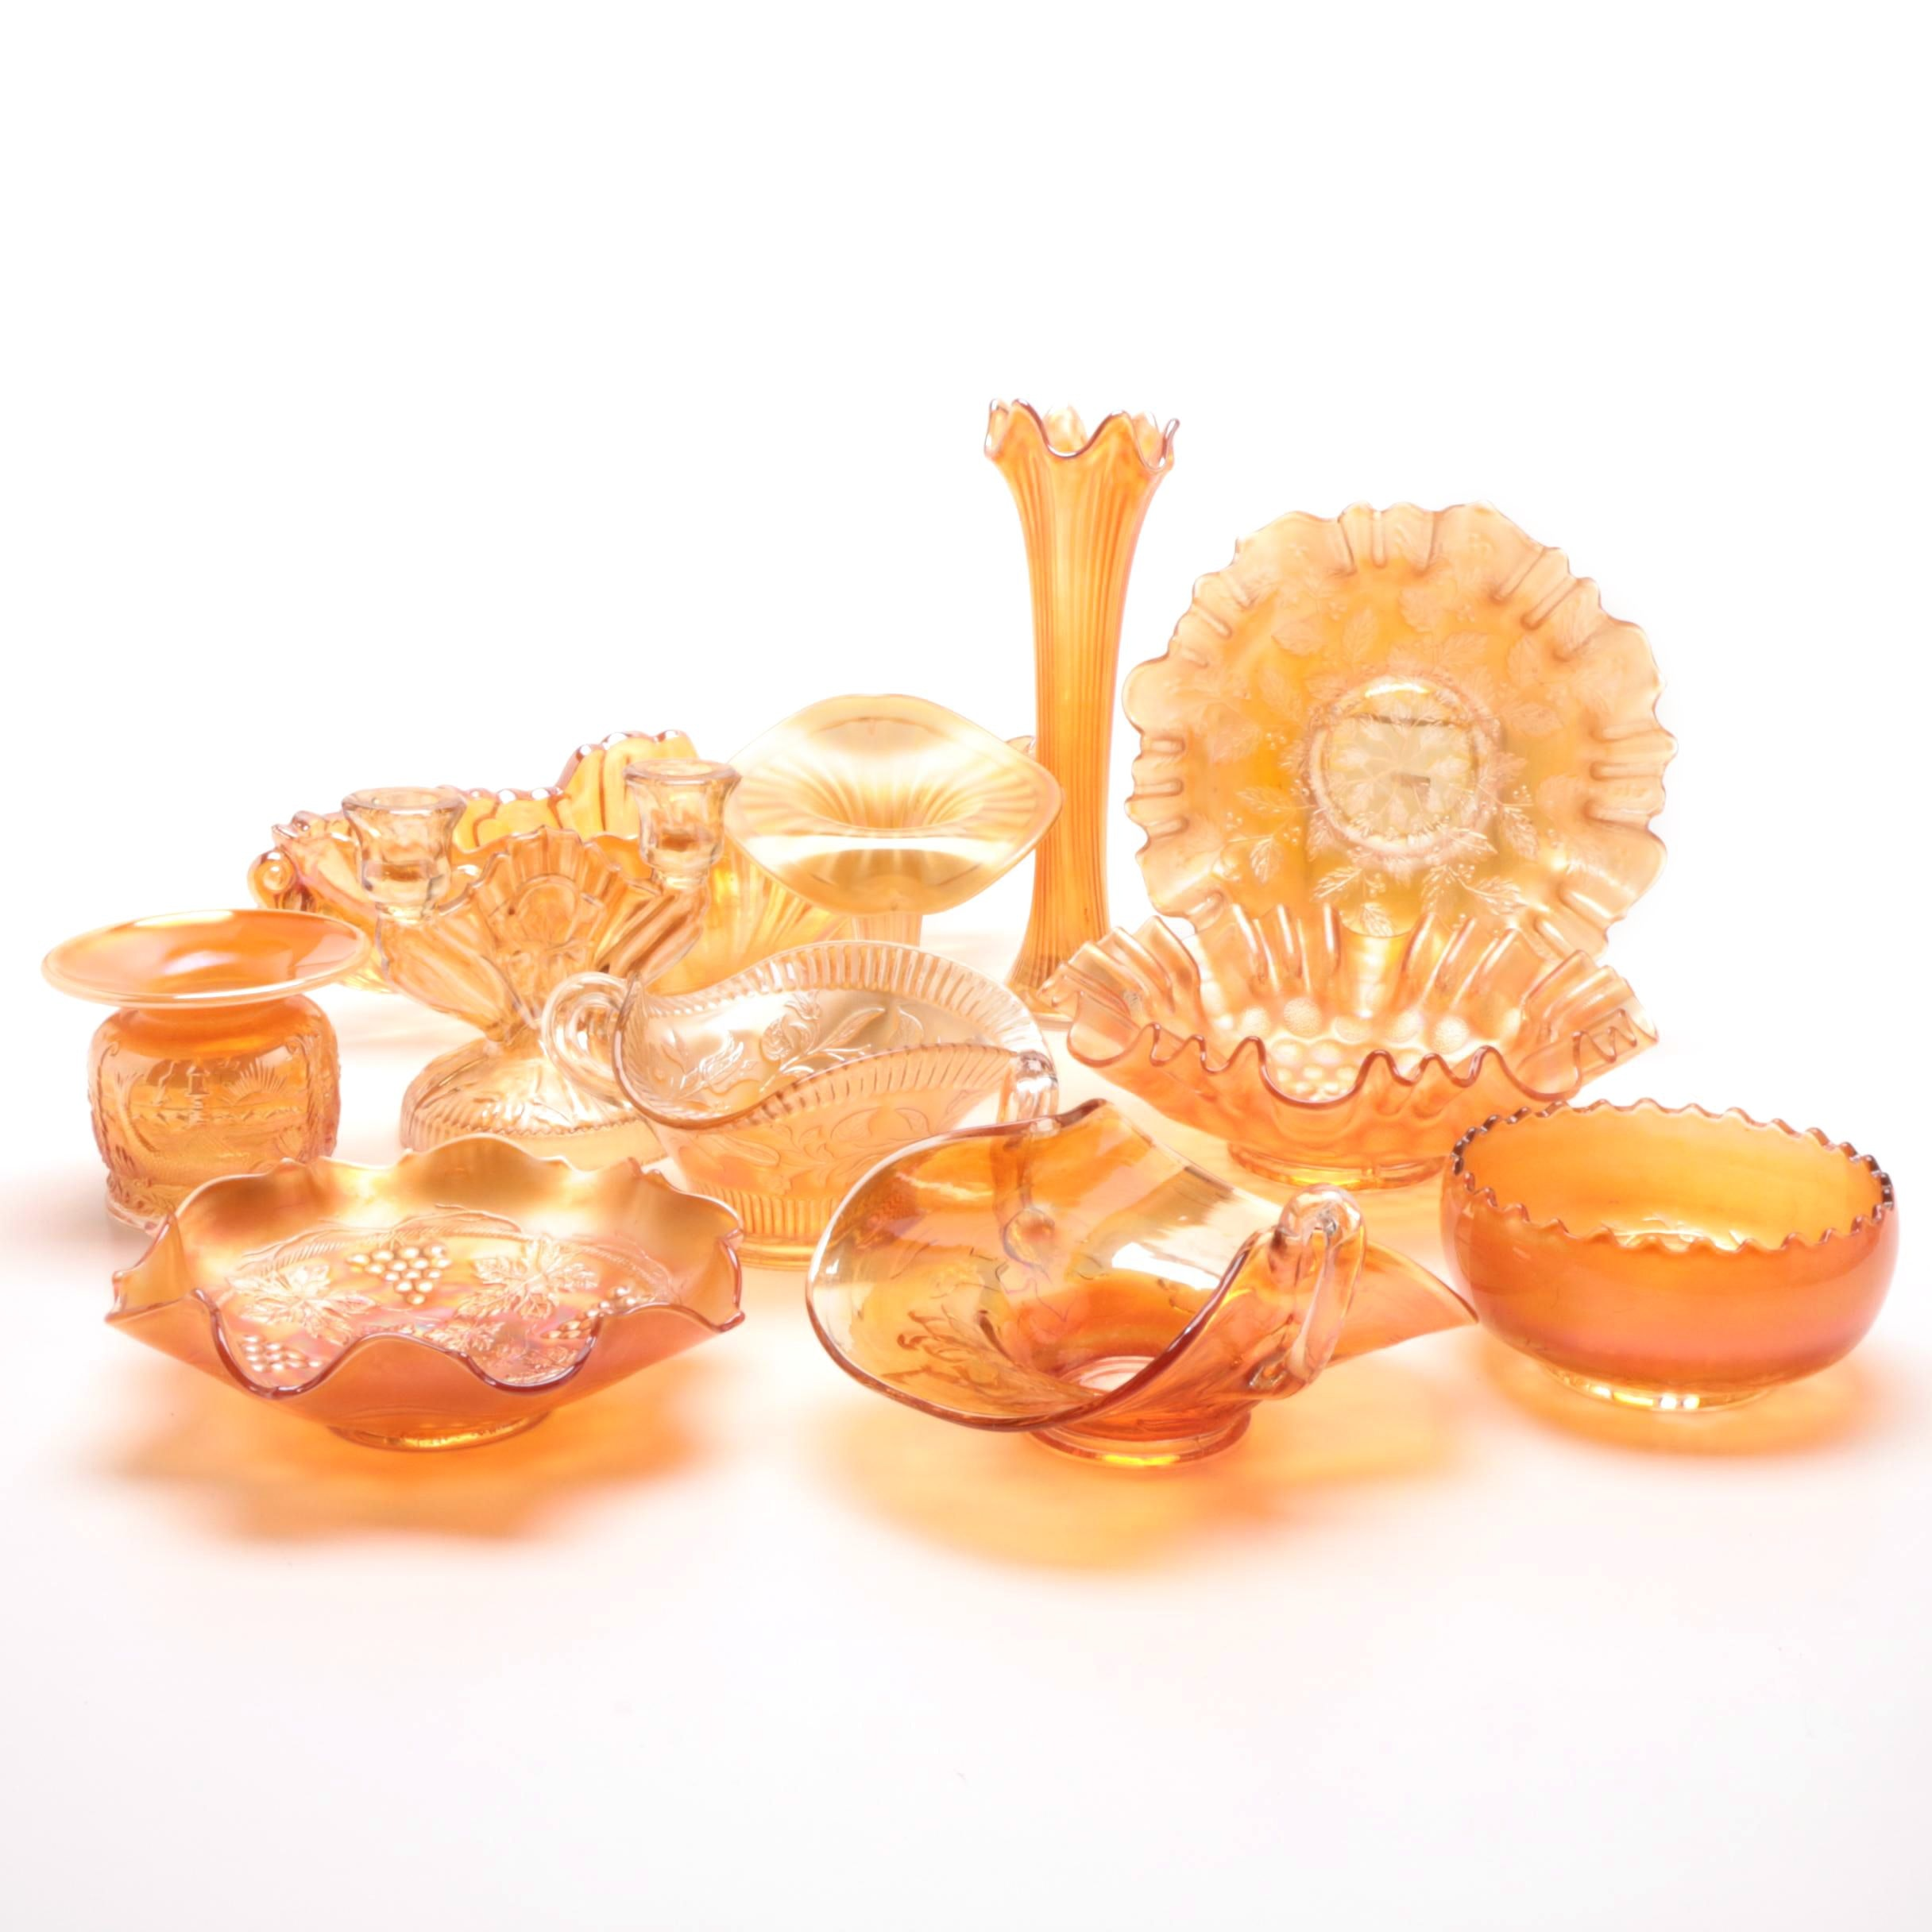 Vintage Carnival Glass Serveware and Decor